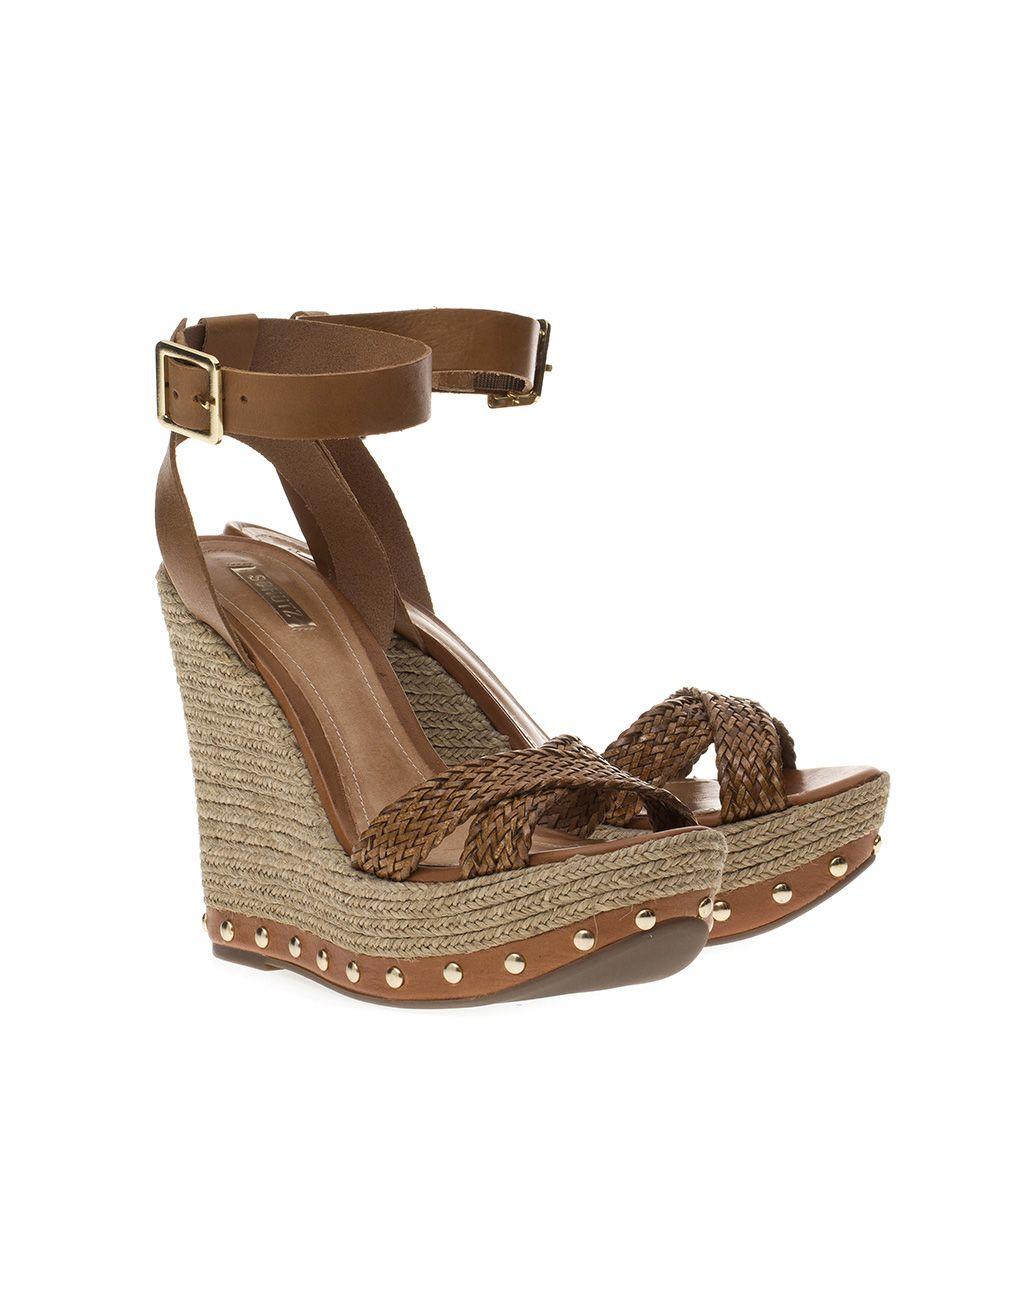 2a19a28d6 Anabela Schutz Atanado | Sandals | Anabela, Looks e Sapatos